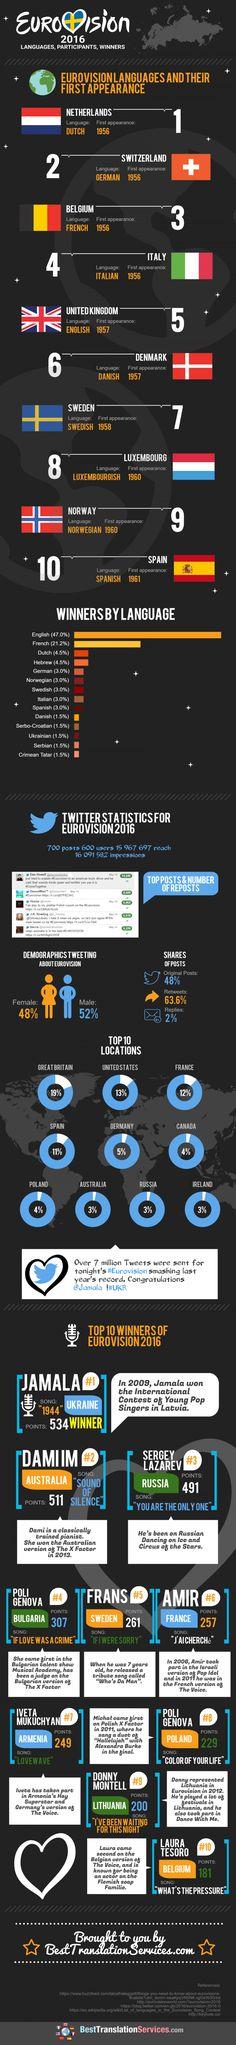 Eurovision 2016. Languages, Participants, Winners #Infographic #Language #History